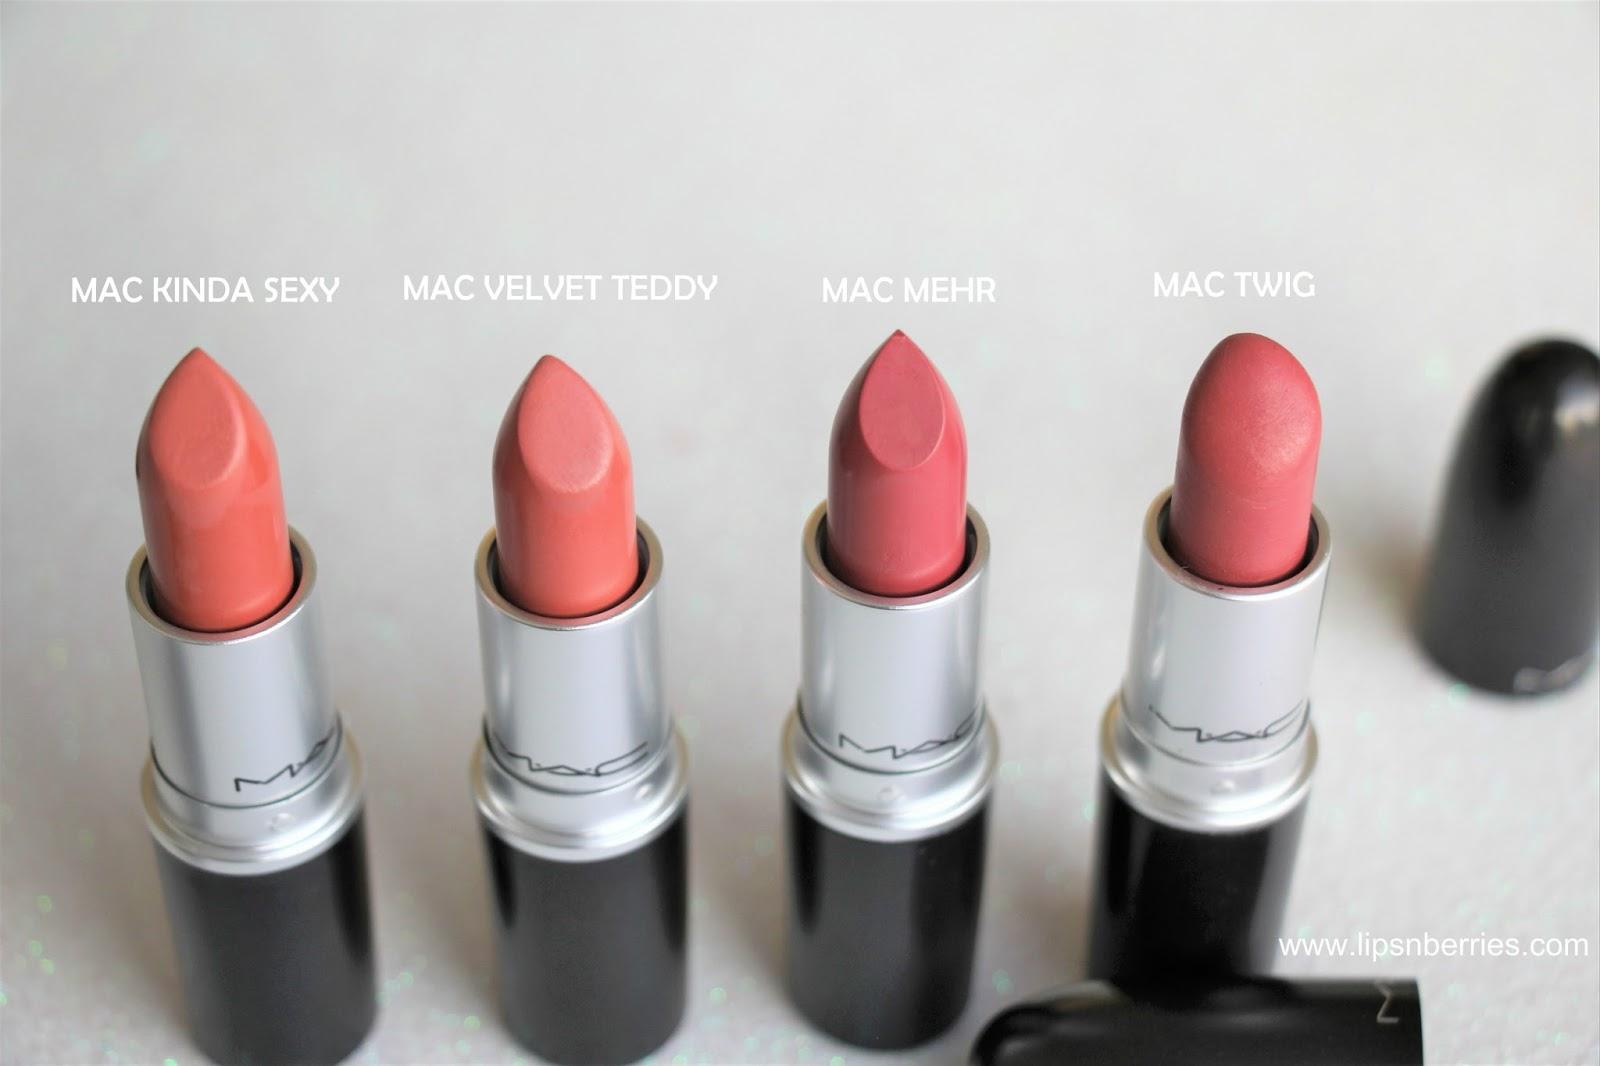 Mac Kinda Sexy Lipstick Review Lips N Berries